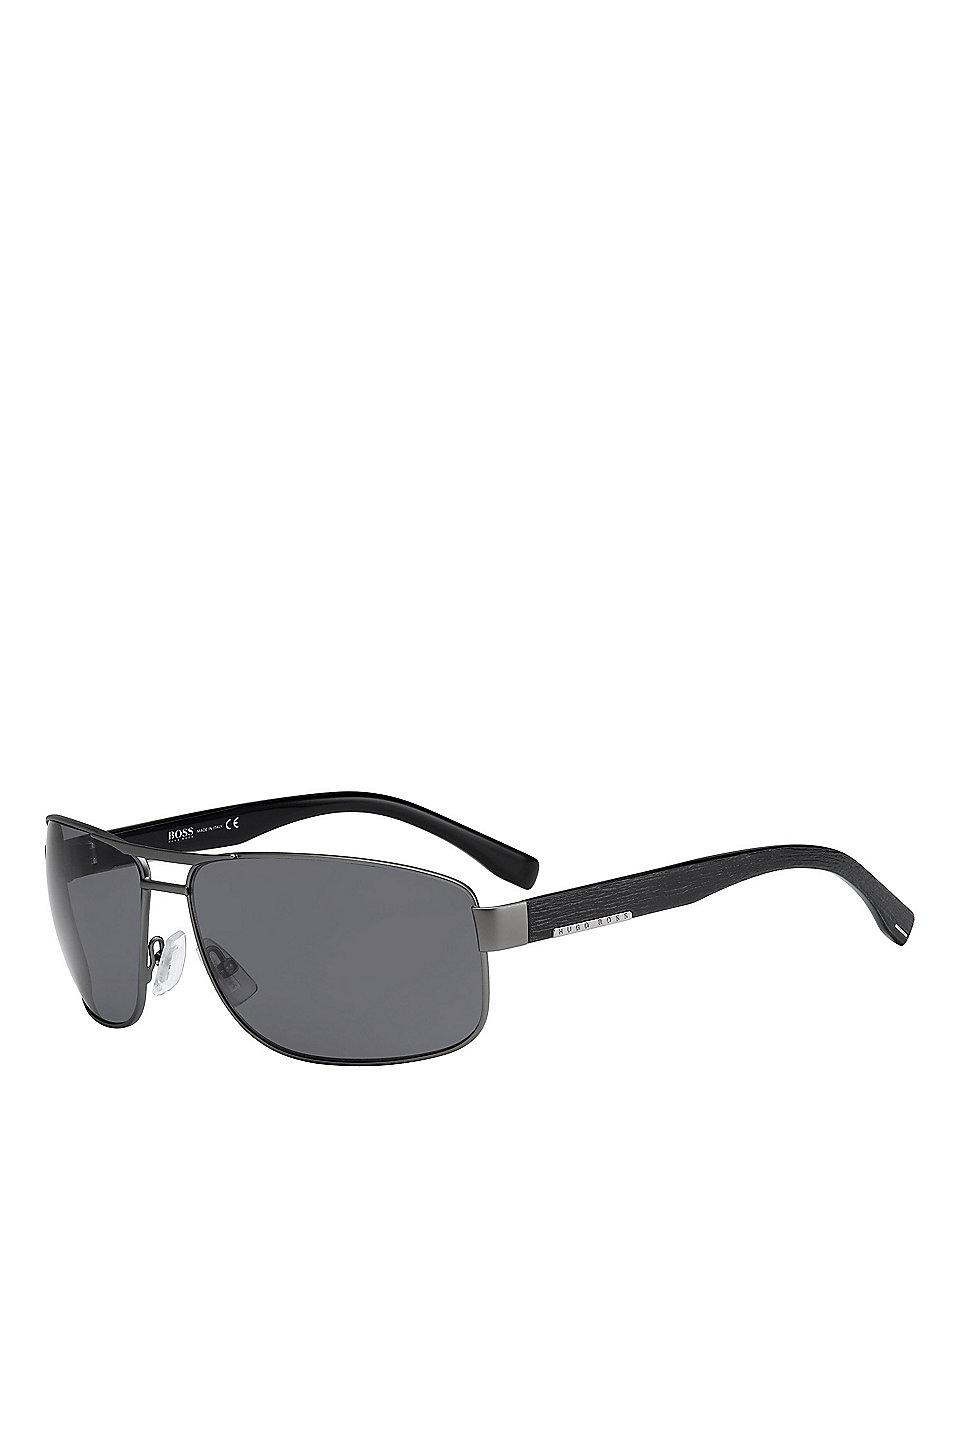 hugo boss sunglasses  BOSS 0668S\u0027